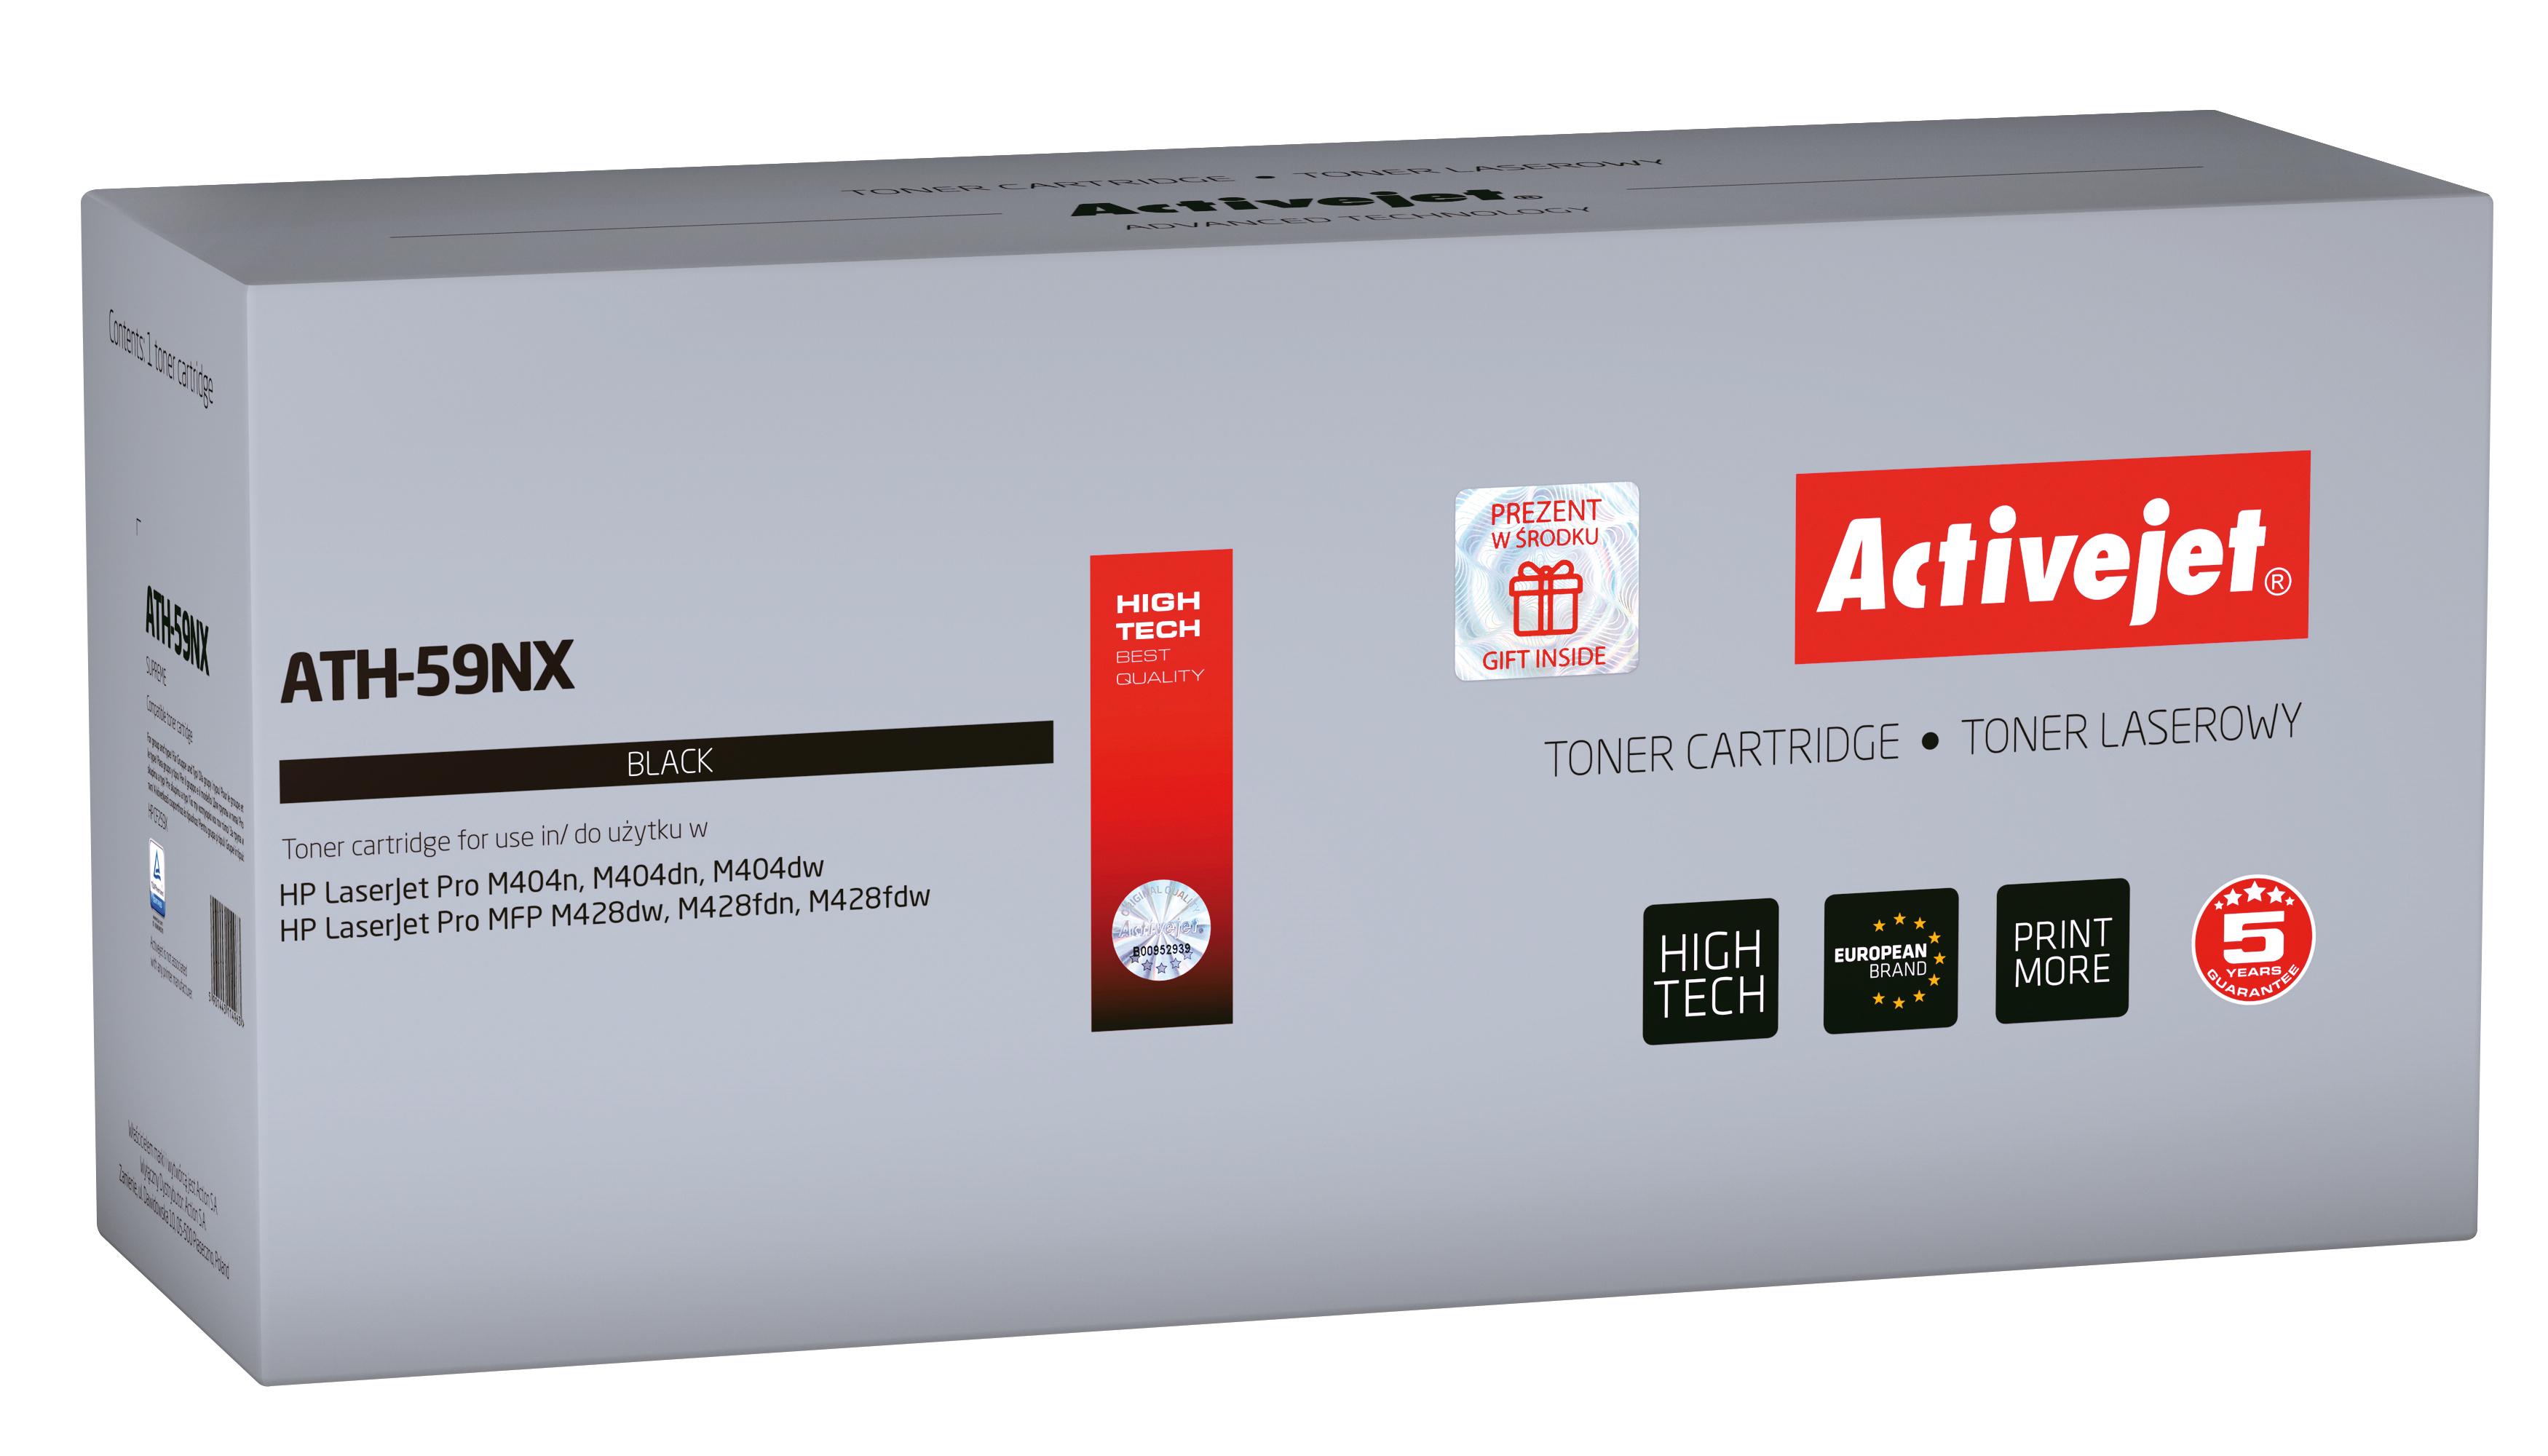 Toner Activejet  ATH-59NX do drukarki HP, Zamiennik HP 59X CF259X; Supreme; 10000 stron; Czarny. Brak chipa